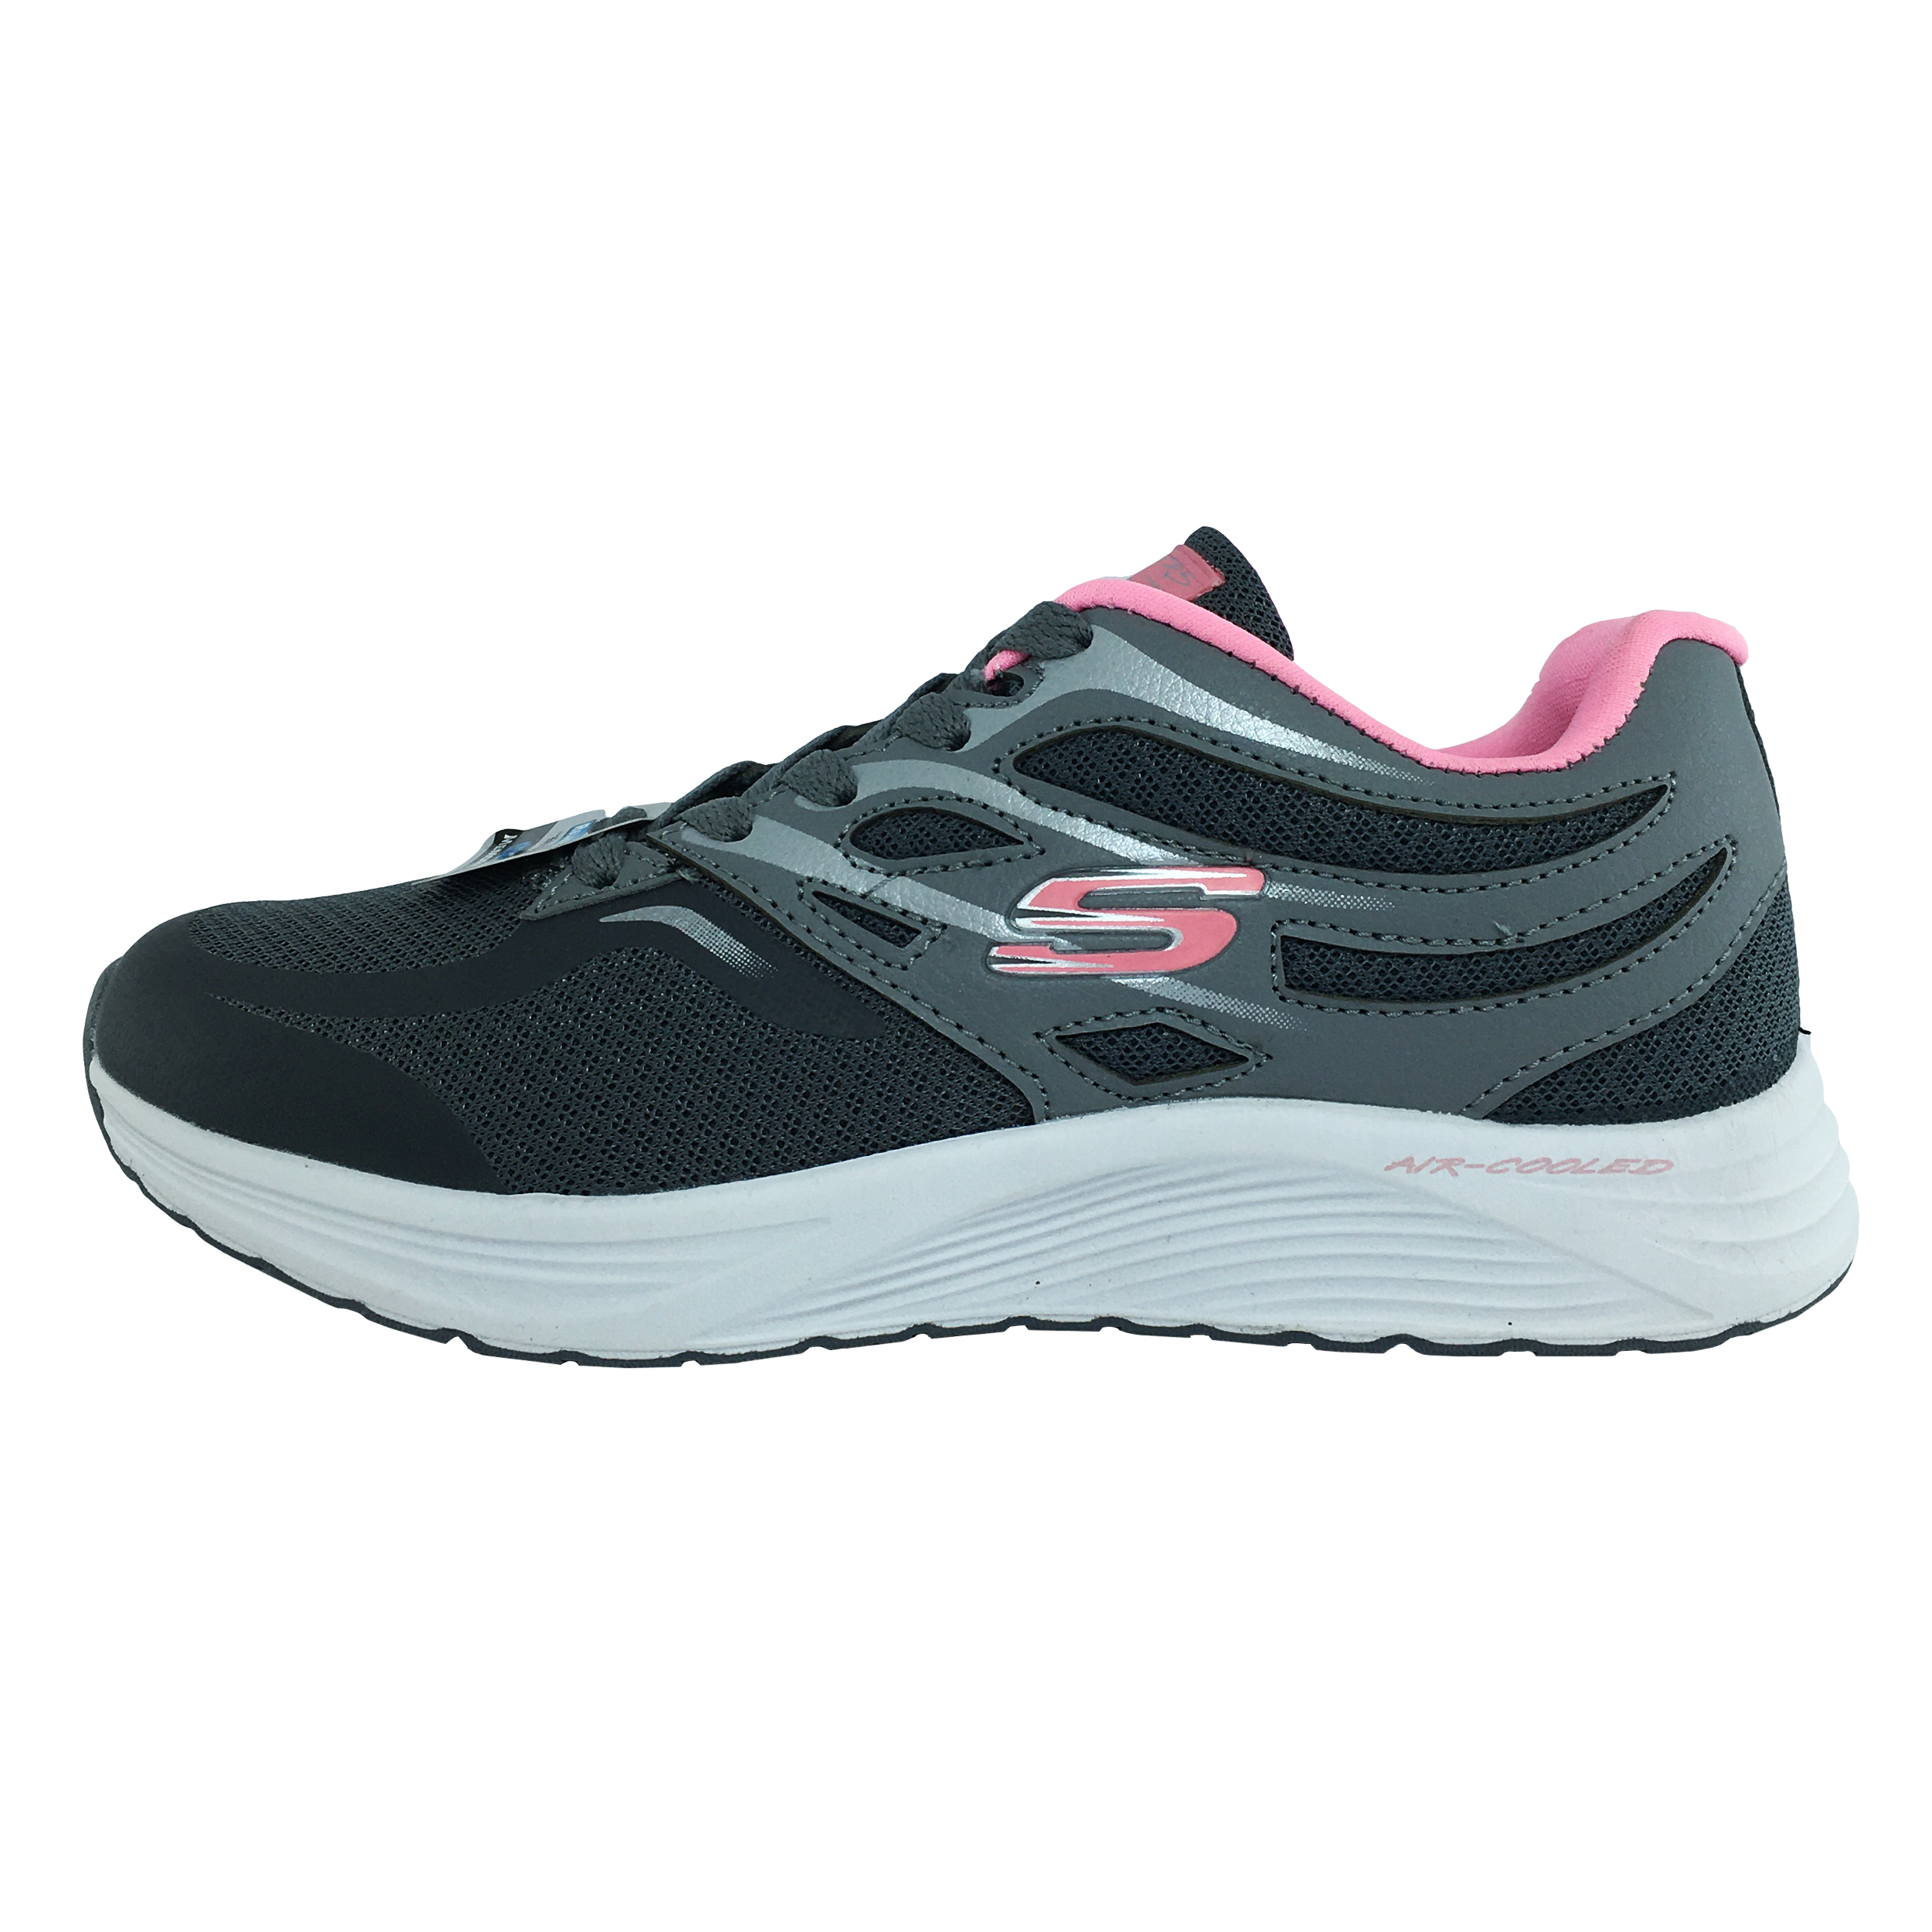 کفش مخصوص پیاده روی زنانه اسکچرز مدل Air-Cooled کد A61